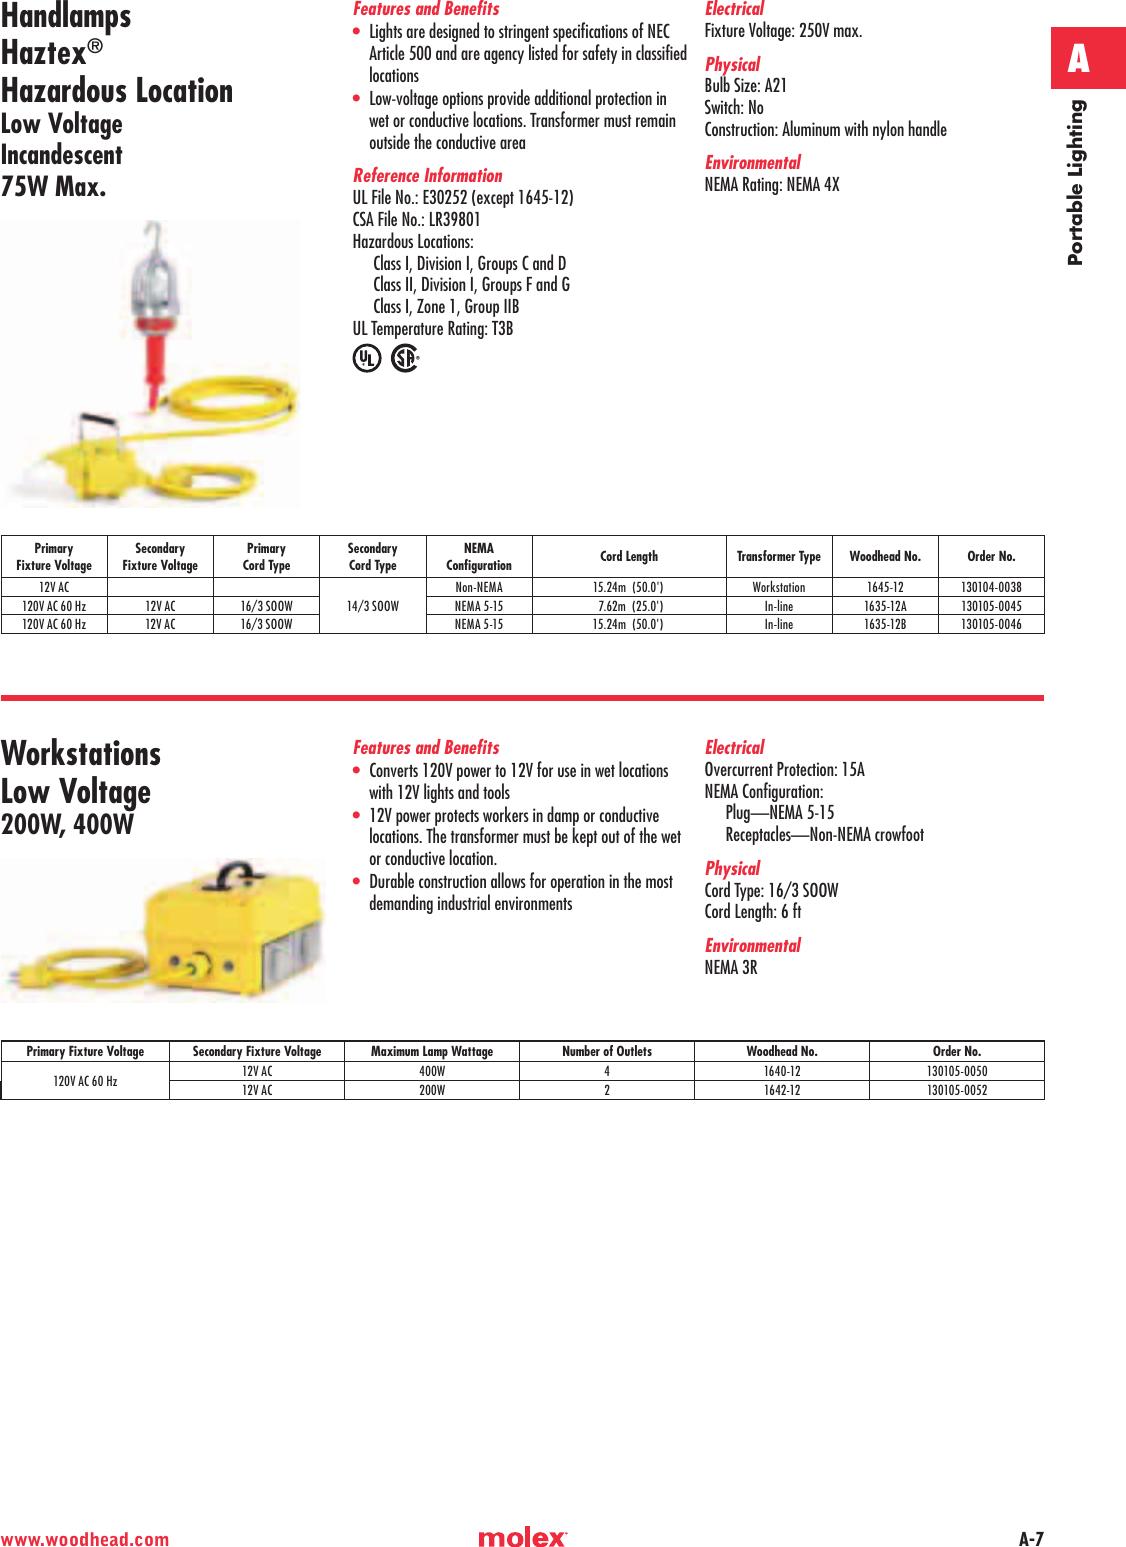 Workstation Transformer Type 50ft Cord Length 26W Lamp Wattage 12VAC Primary Fixture Voltage 16//3 SOOW Cord Type Fluorescent Bulb Hazardous Location Non-NEMA Configuration Woodhead 1090-HZ12B163 Haztex Handlamp